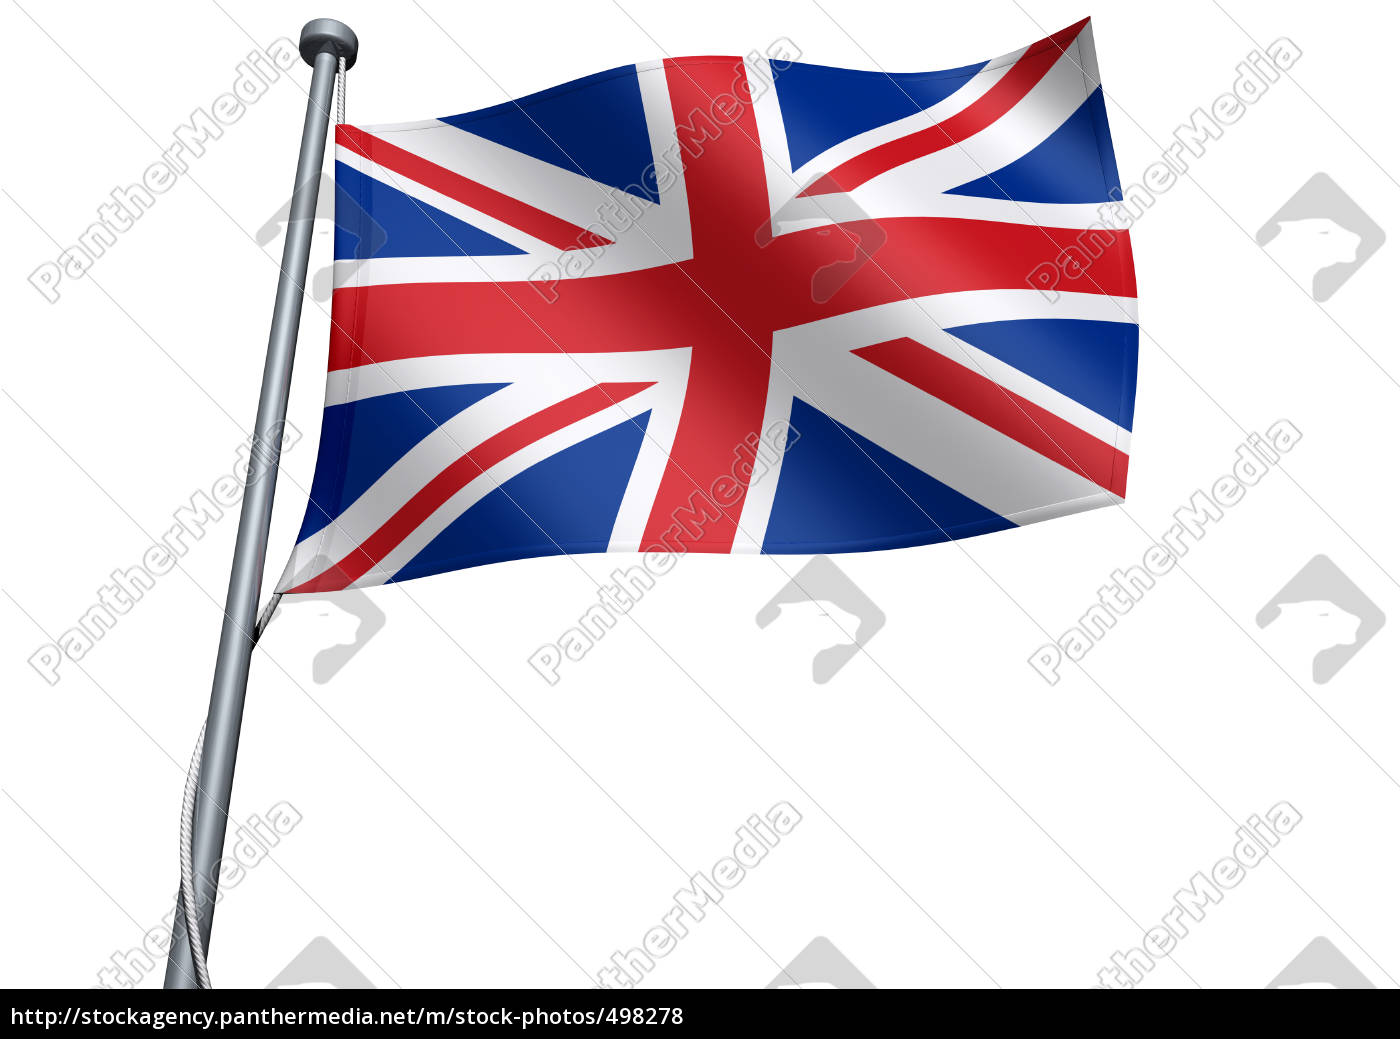 united, kingdom - 498278